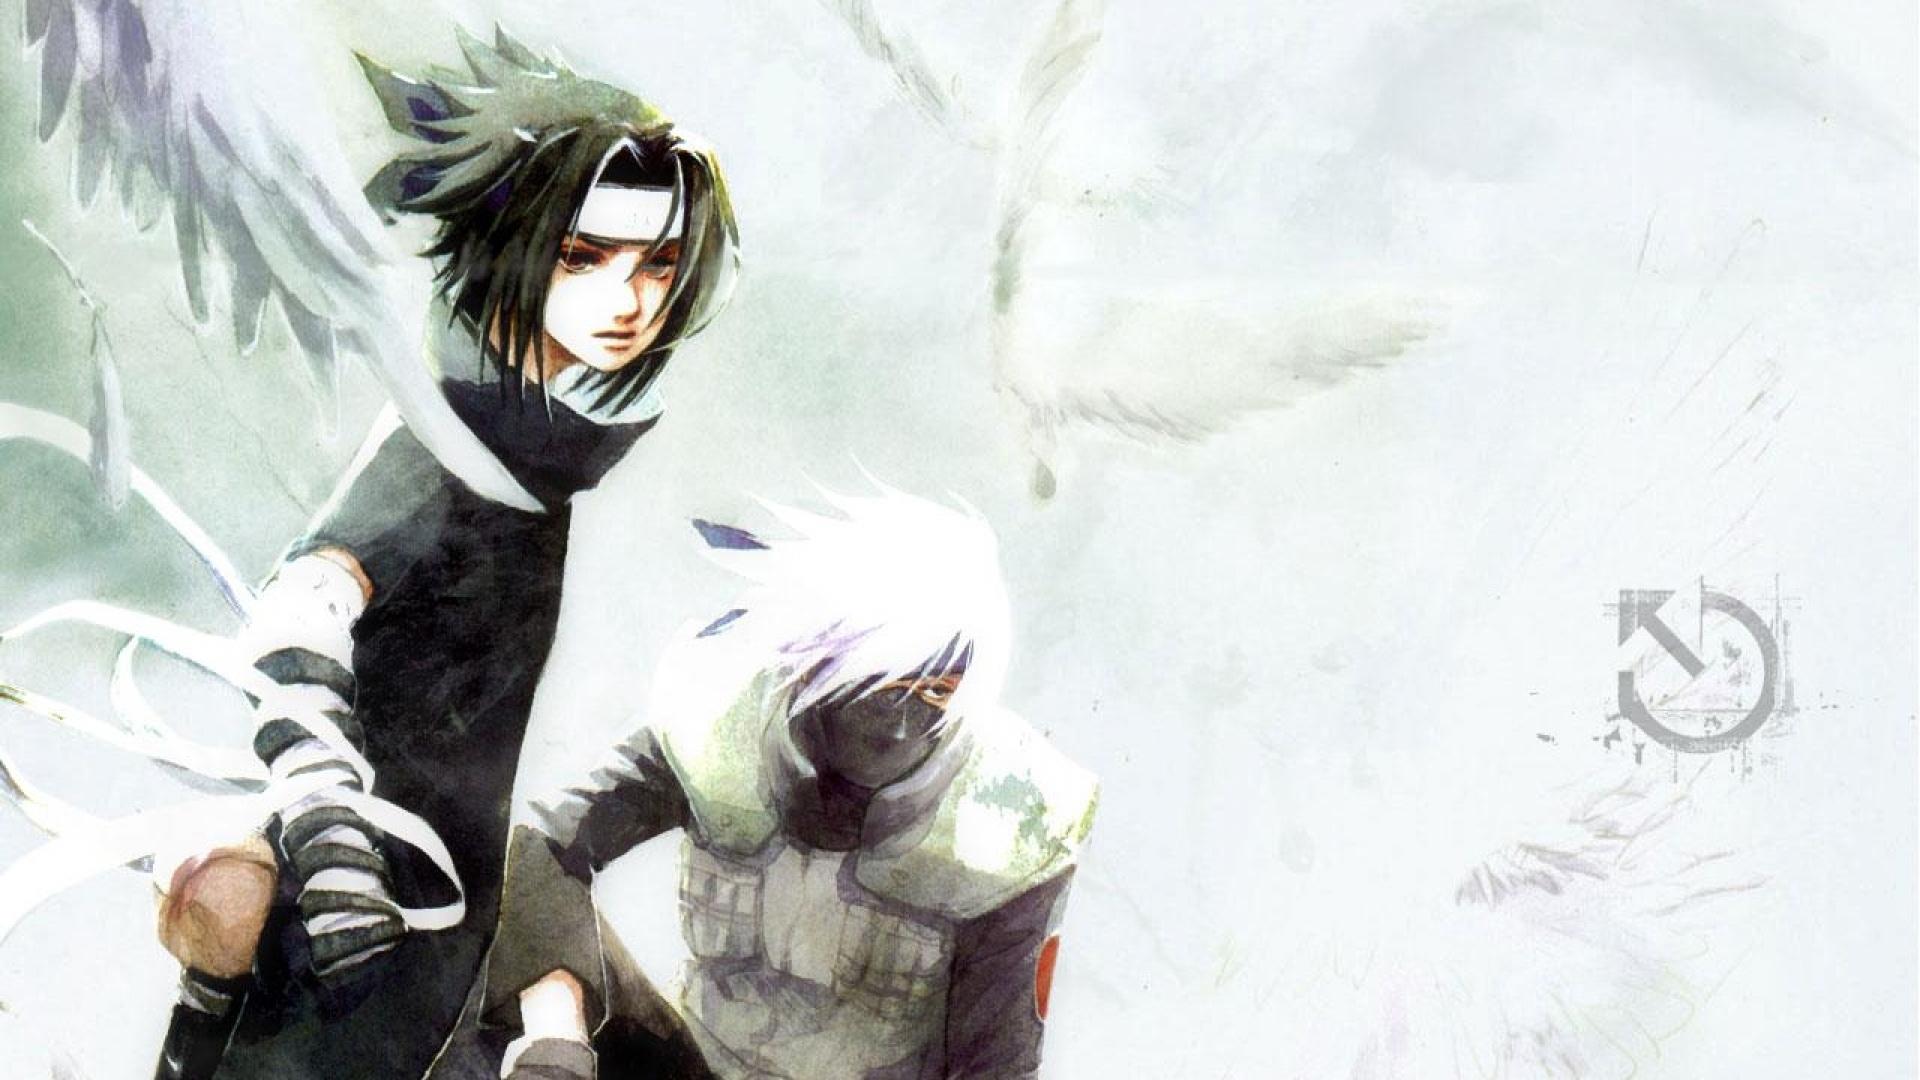 Free Download Anime Full Hd Wallpapers Download 1080p Desktop